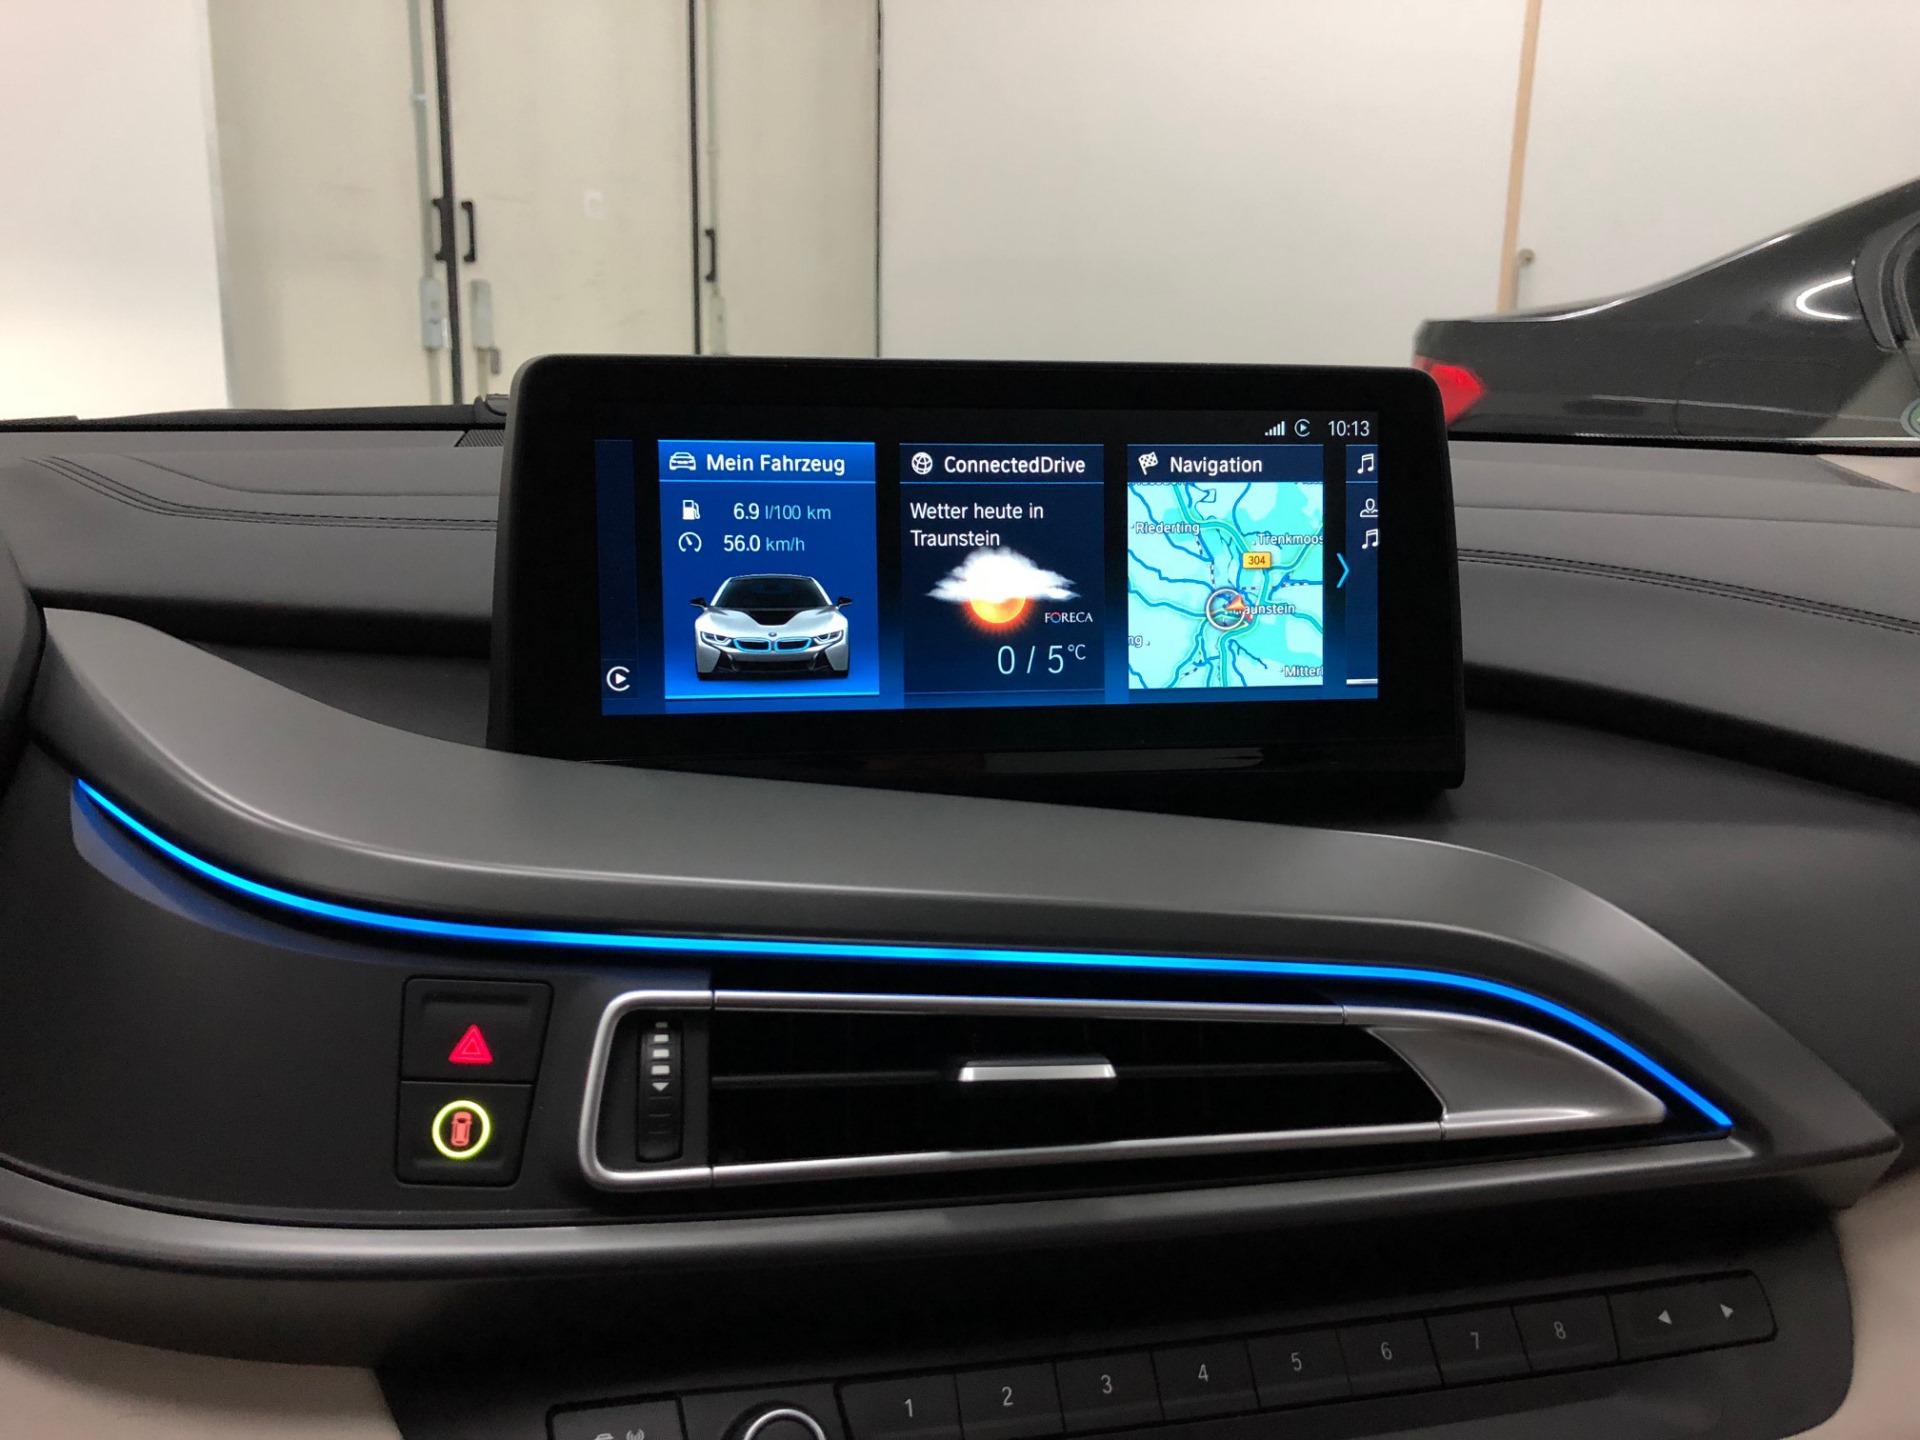 BMW i8 iDrive ID6 Umbau 2018 Infotainment Bimmer Manufaktur 01 2